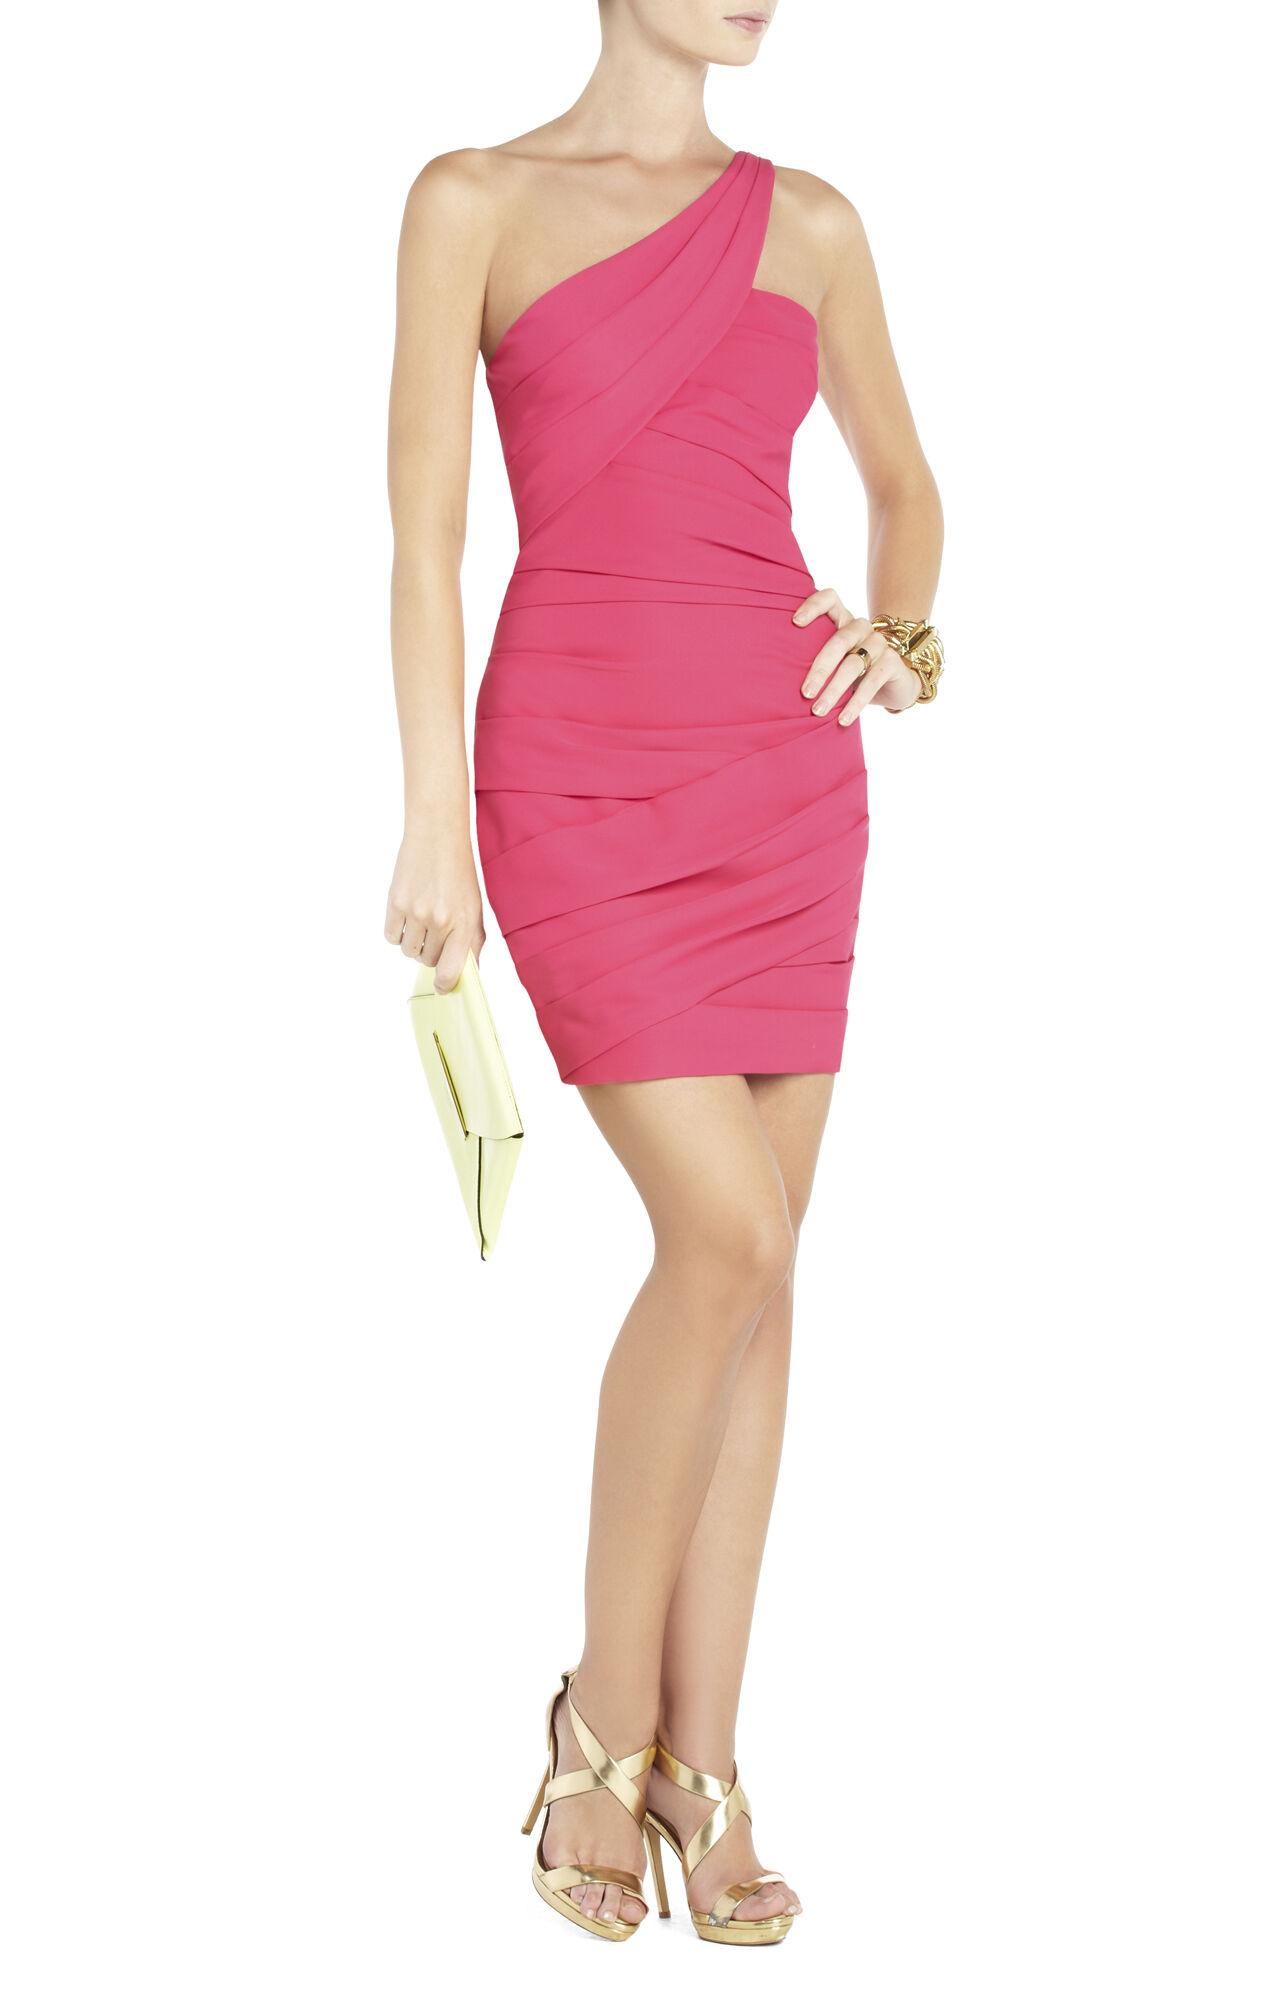 Versa One-Shoulder Cocktail Dress